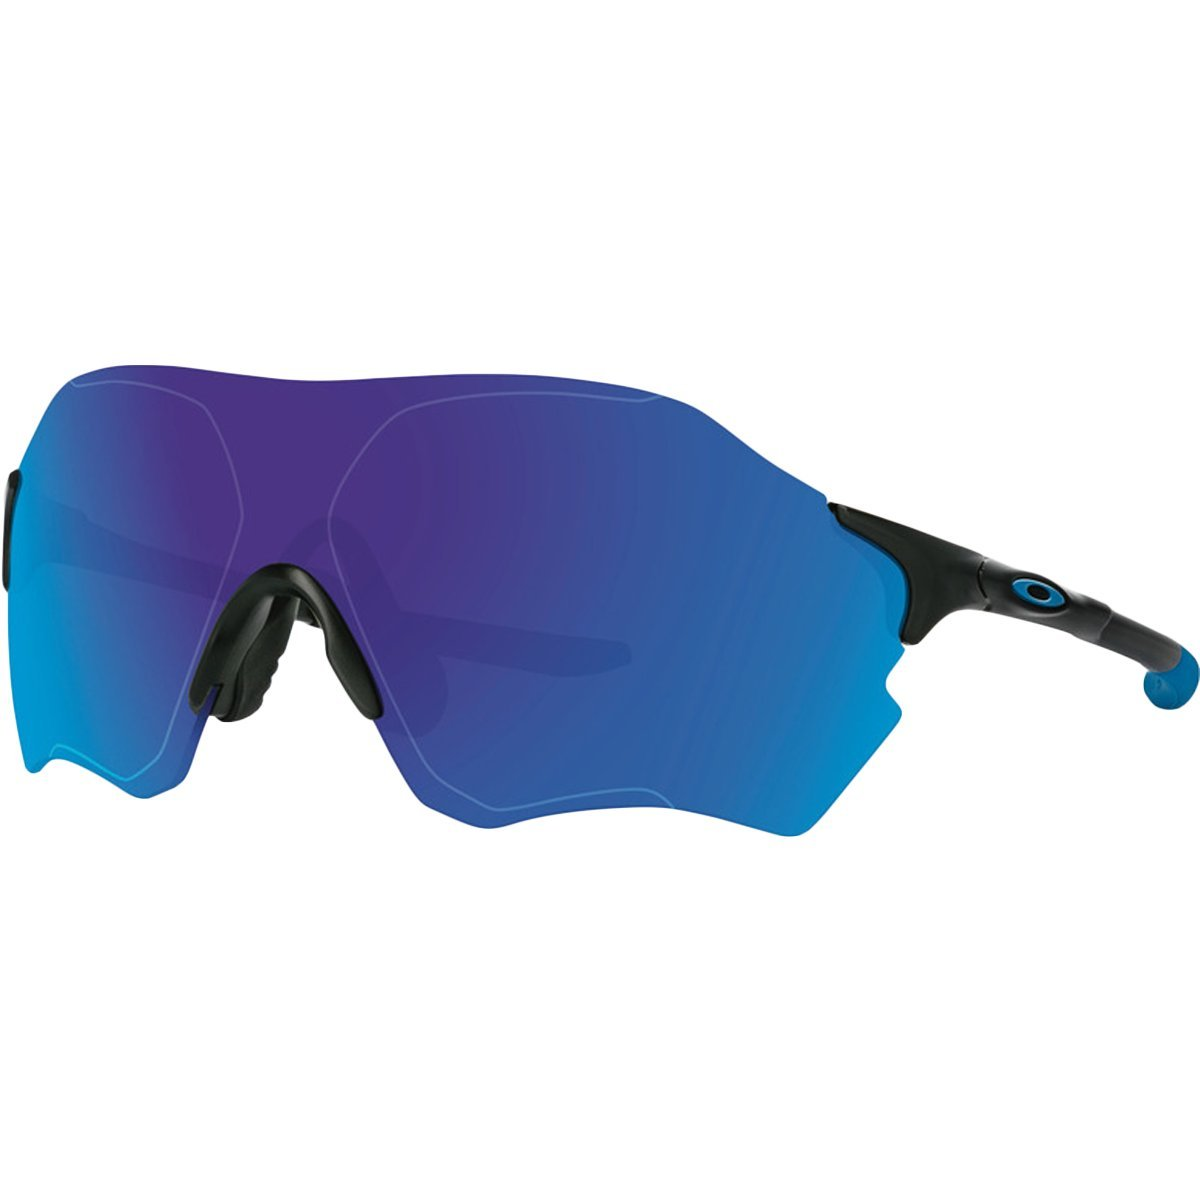 Oakley Mens EV Zero Range Polarized Sunglasses, Matte Black/Sapphire Iridium, One Size by Oakley